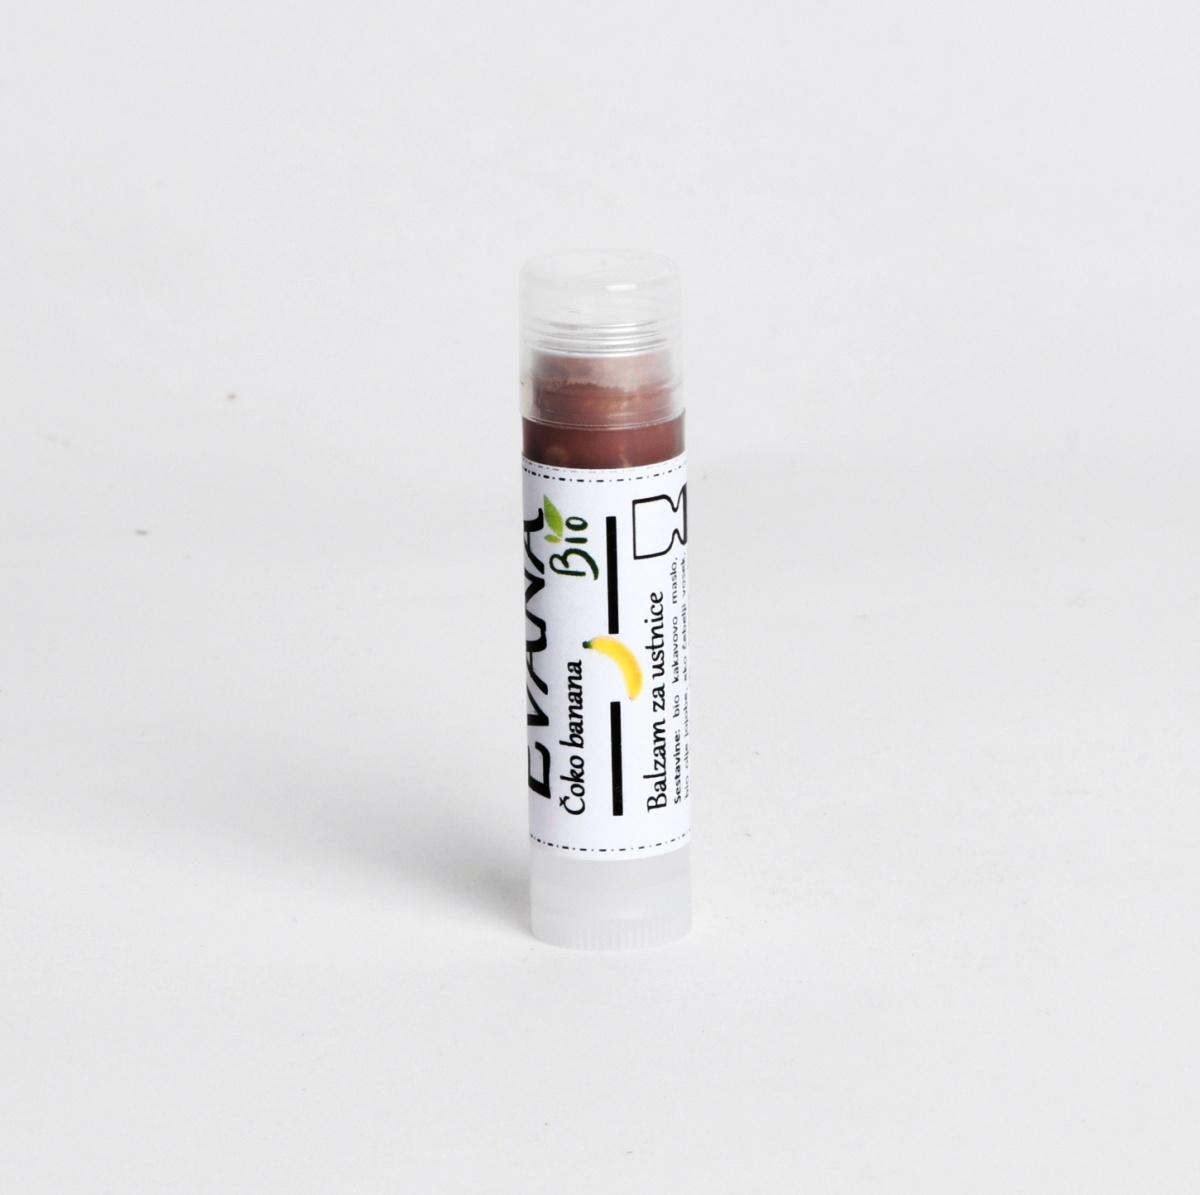 BIO balzam za ustnice 03 02 02 005